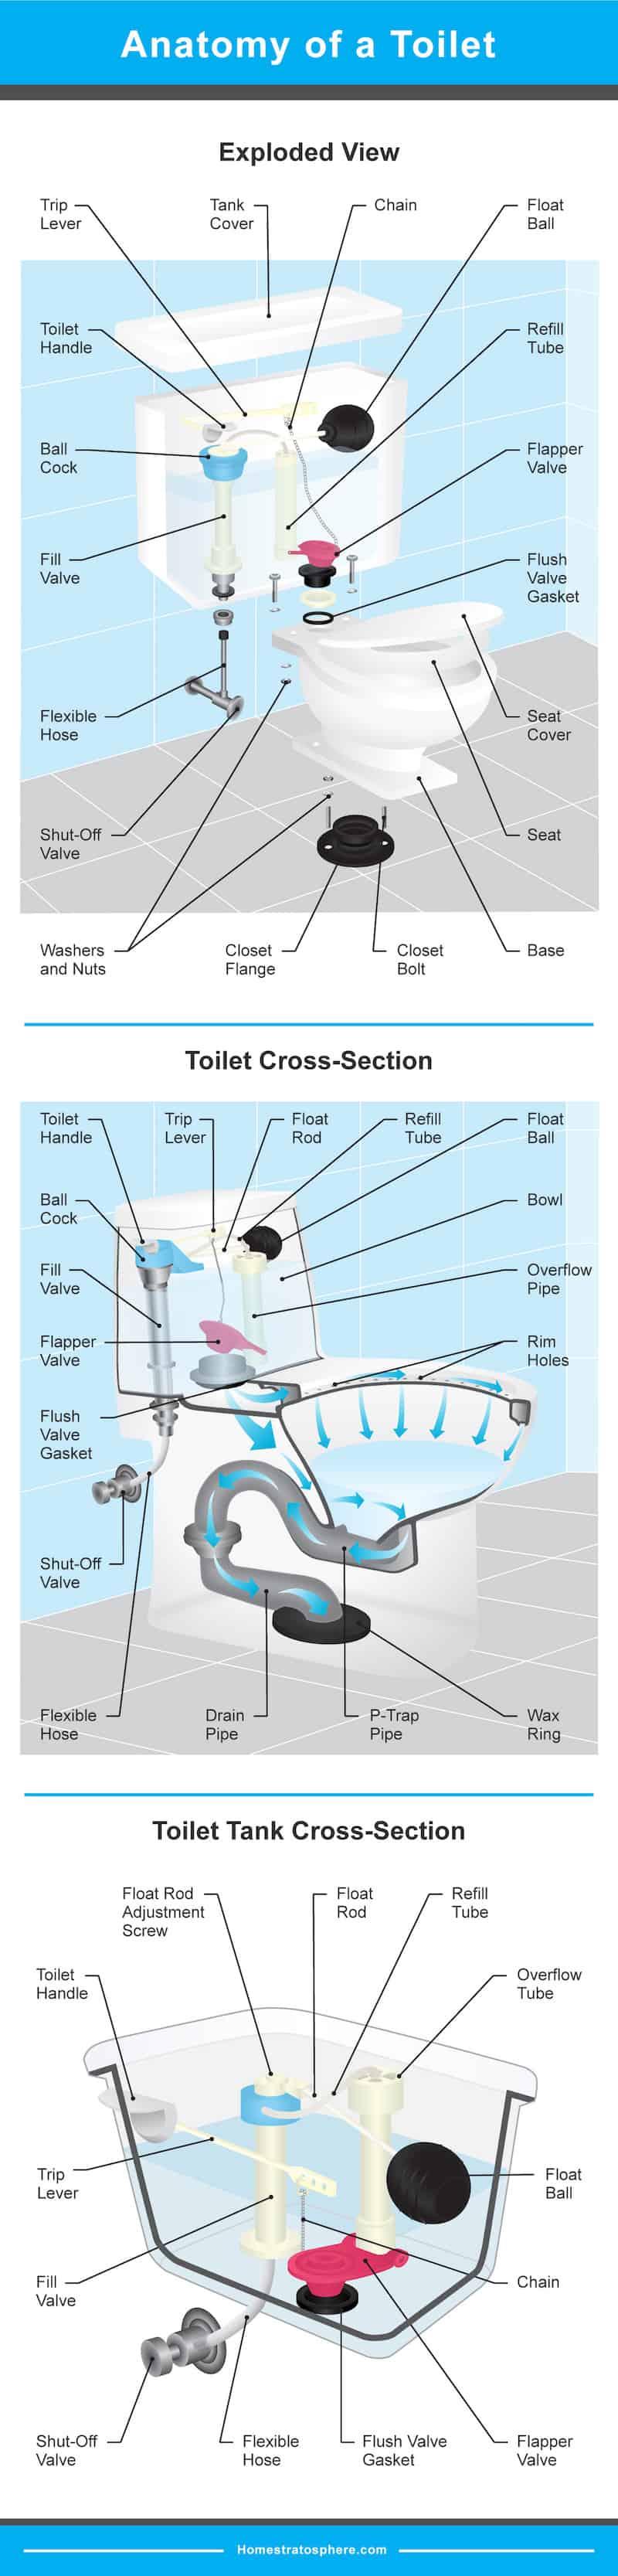 medium resolution of parts of a toilet diagram